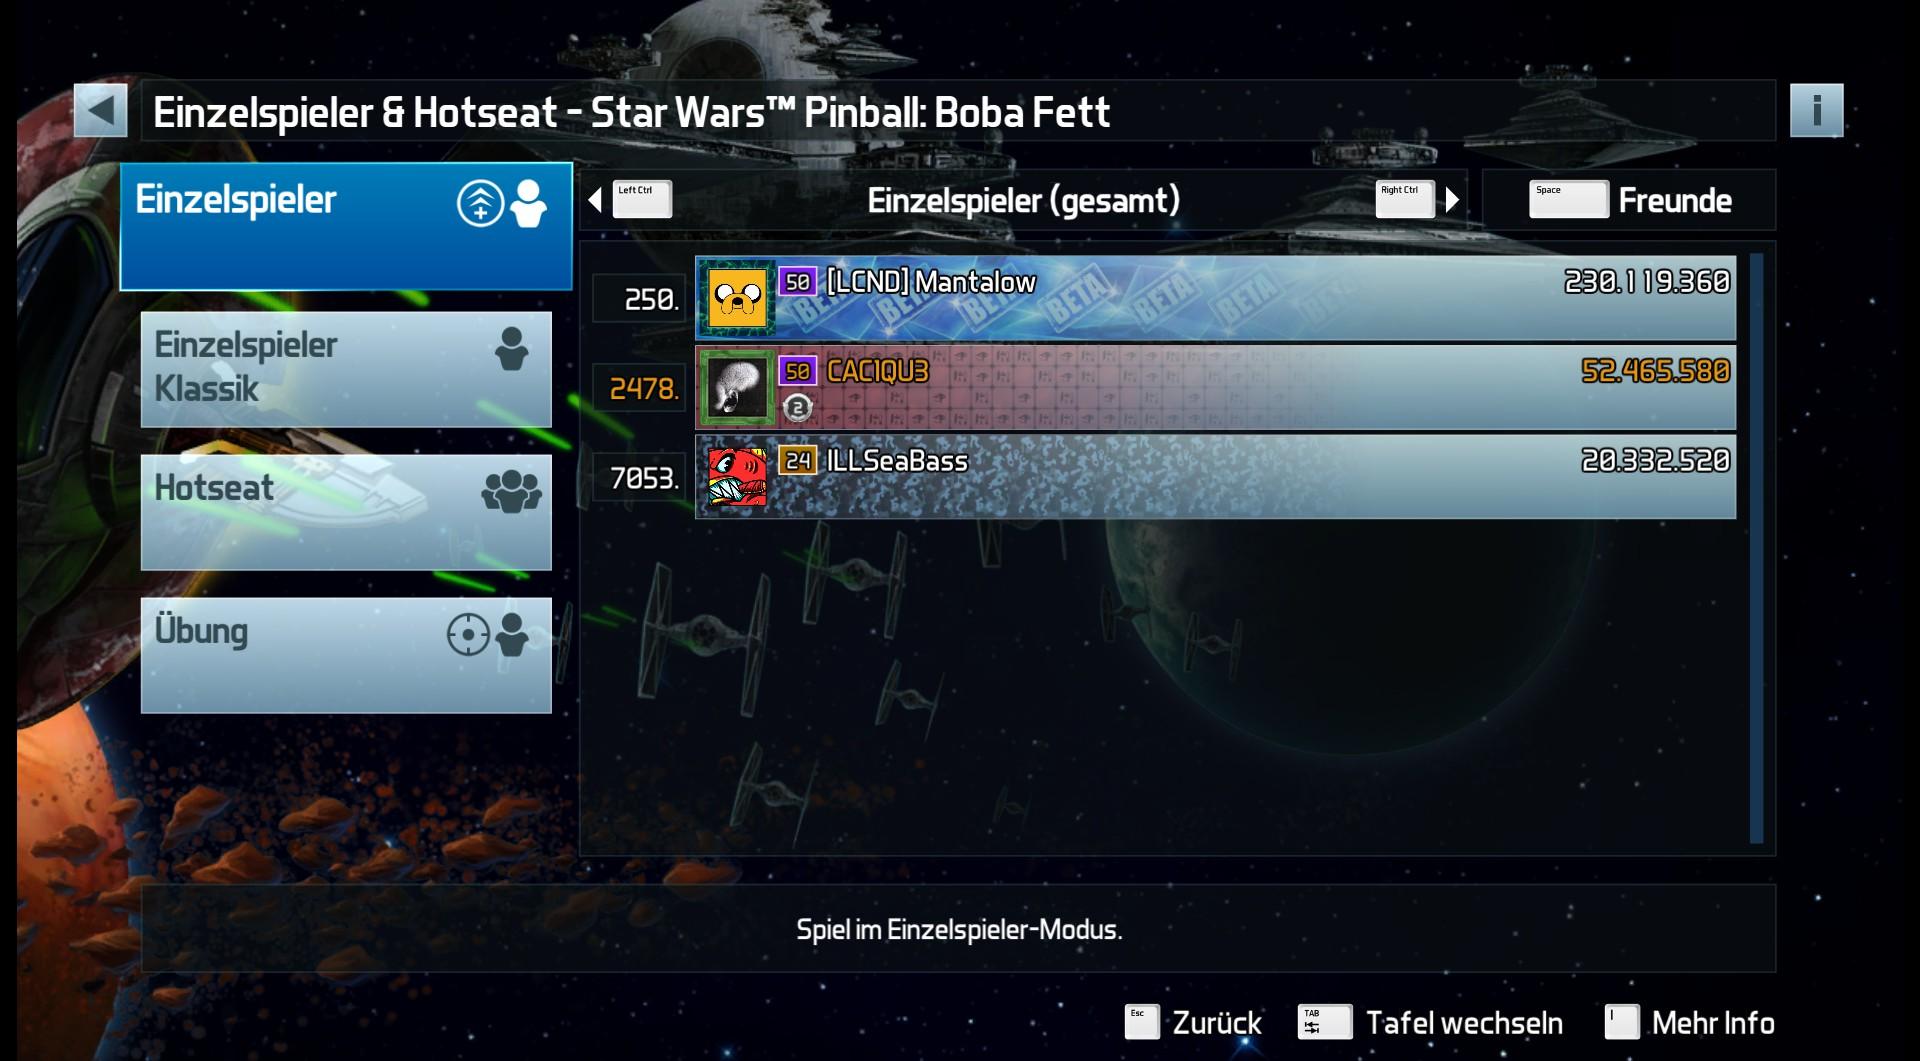 CAC1QU3: Pinball FX3: Star Wars Pinball: Boba Fett (PC) 52,465,580 points on 2019-04-11 22:24:20